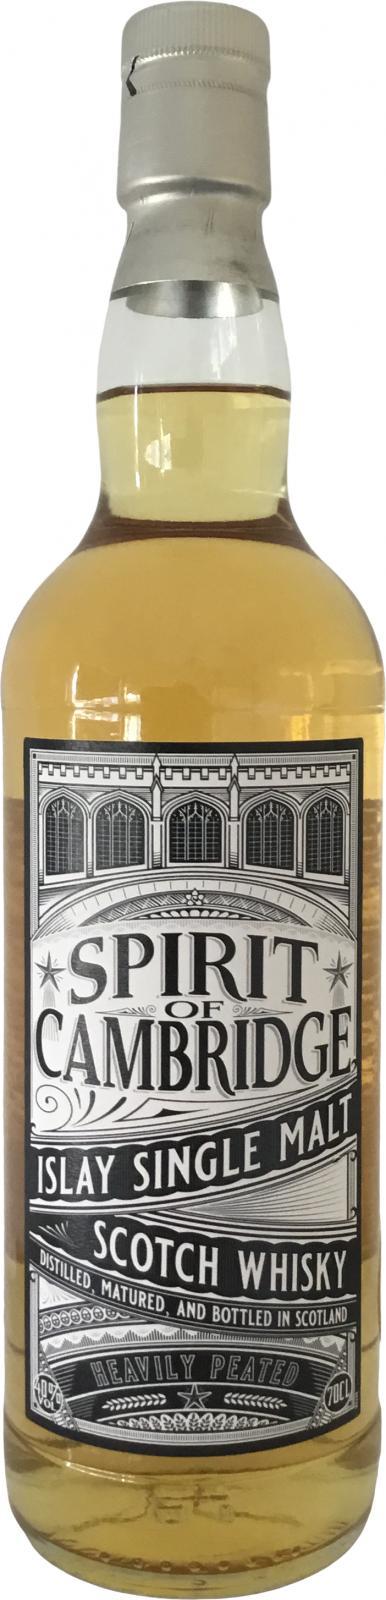 Islay Single Malt Scotch Whisky Spirit of Cambridge